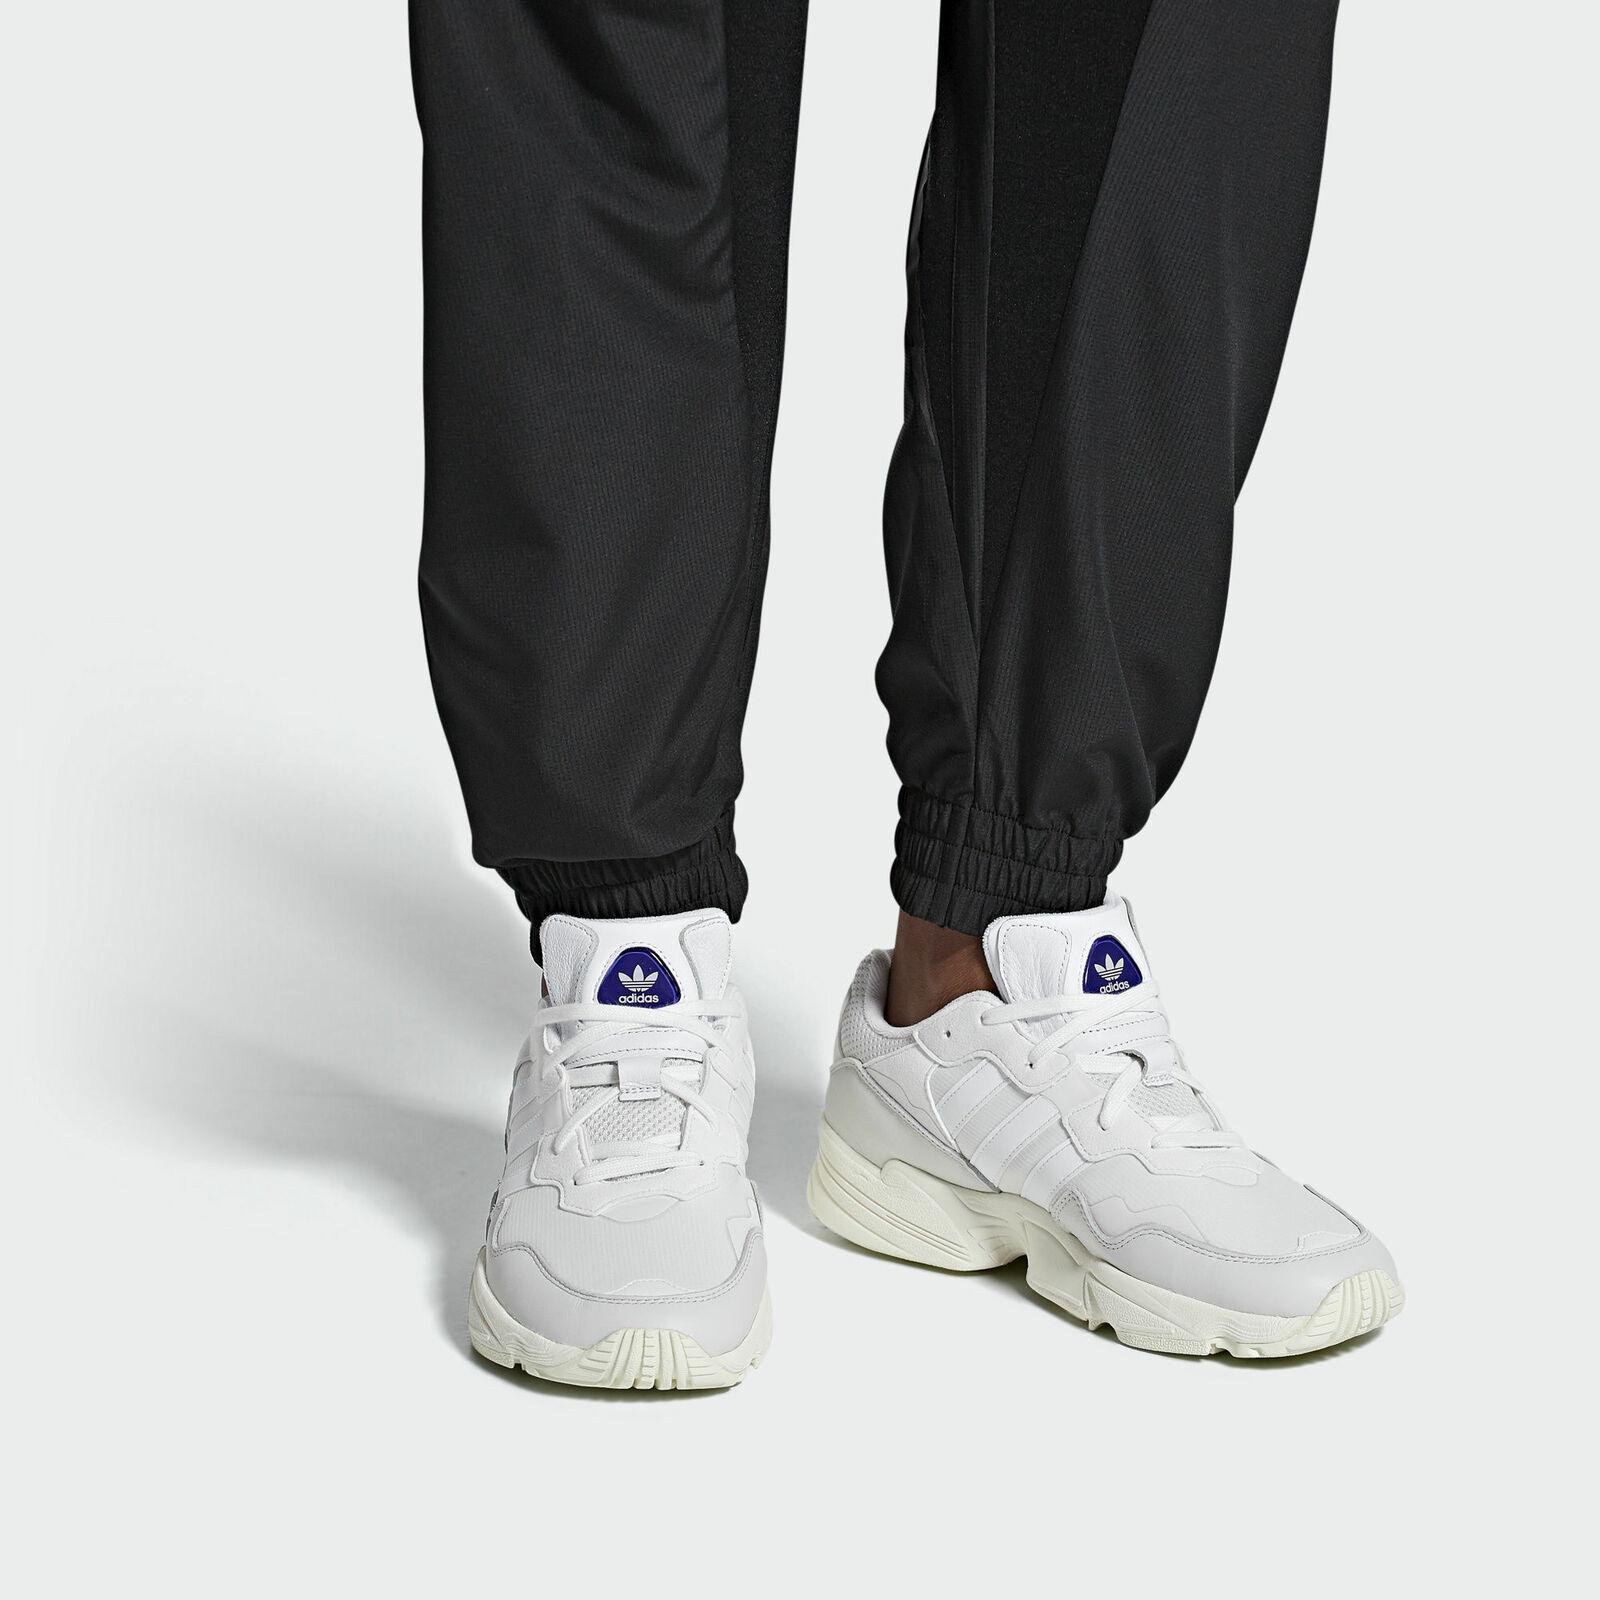 Adidas Originals Herren Yung Schuhe 96 bf7gvyY6